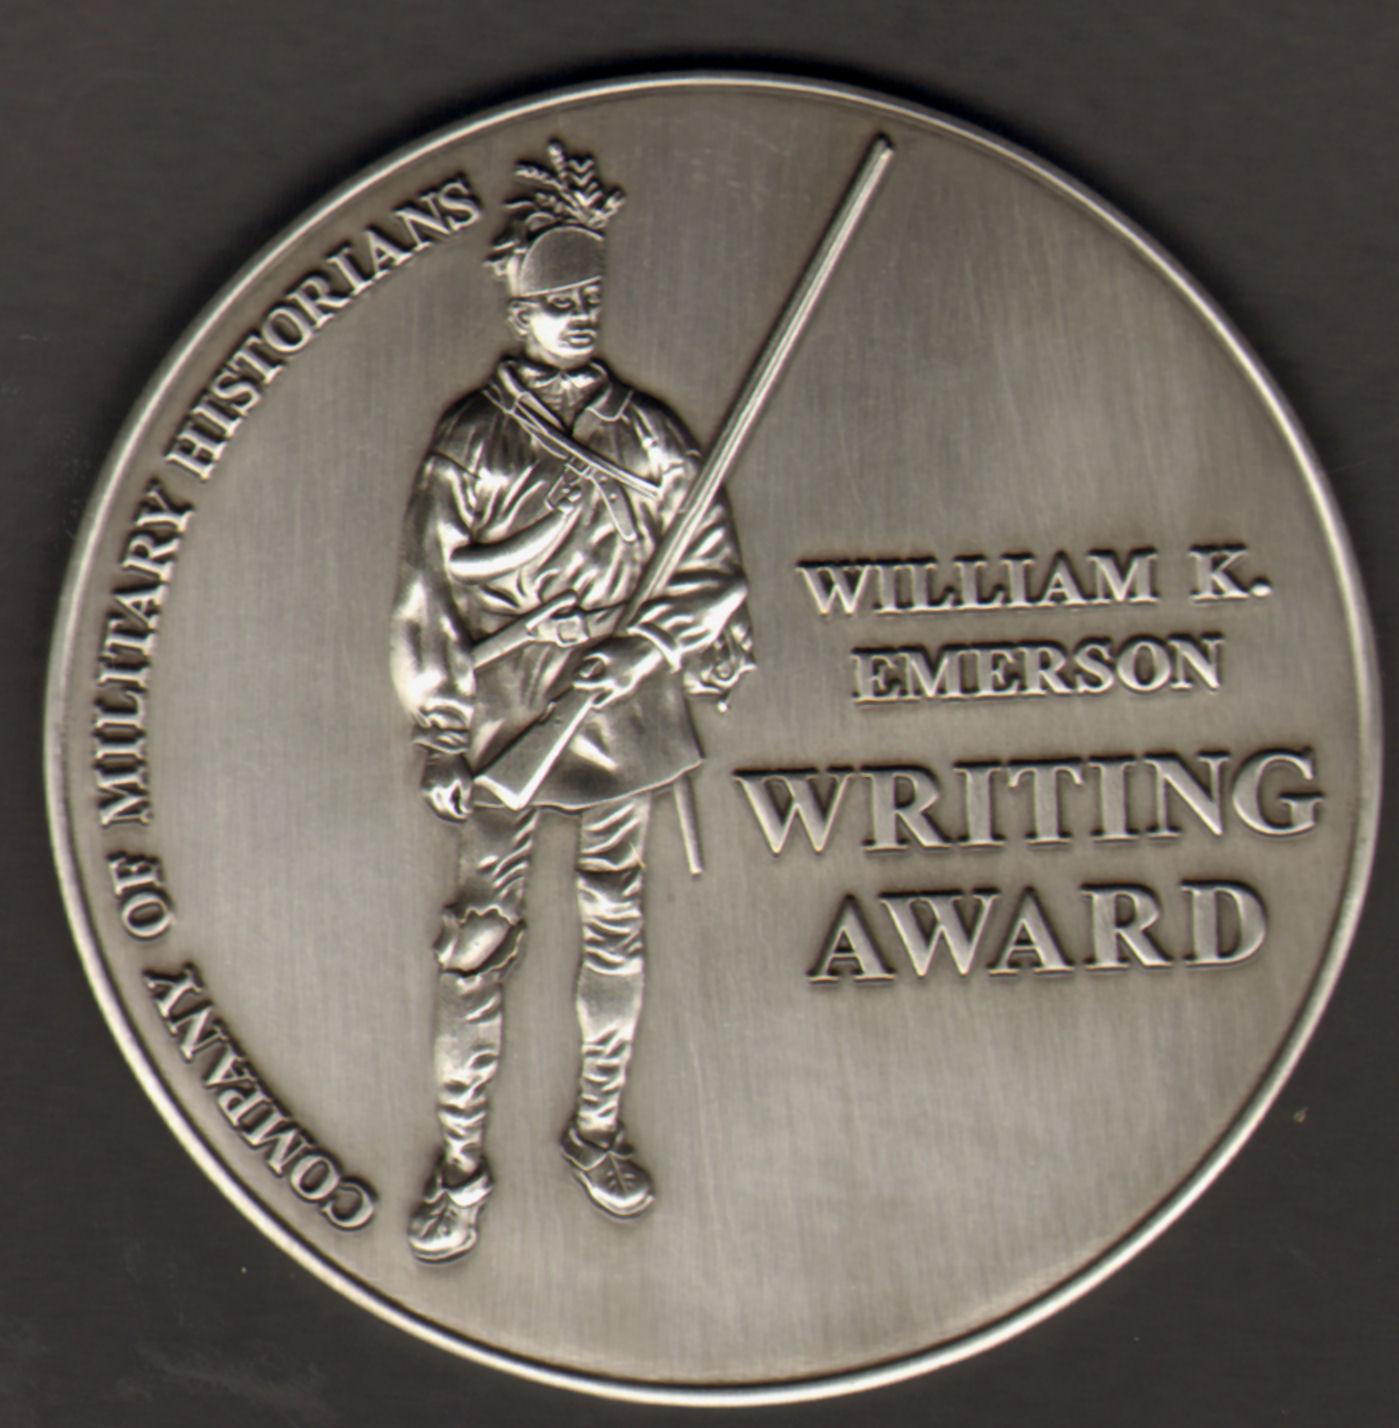 Emerson Award